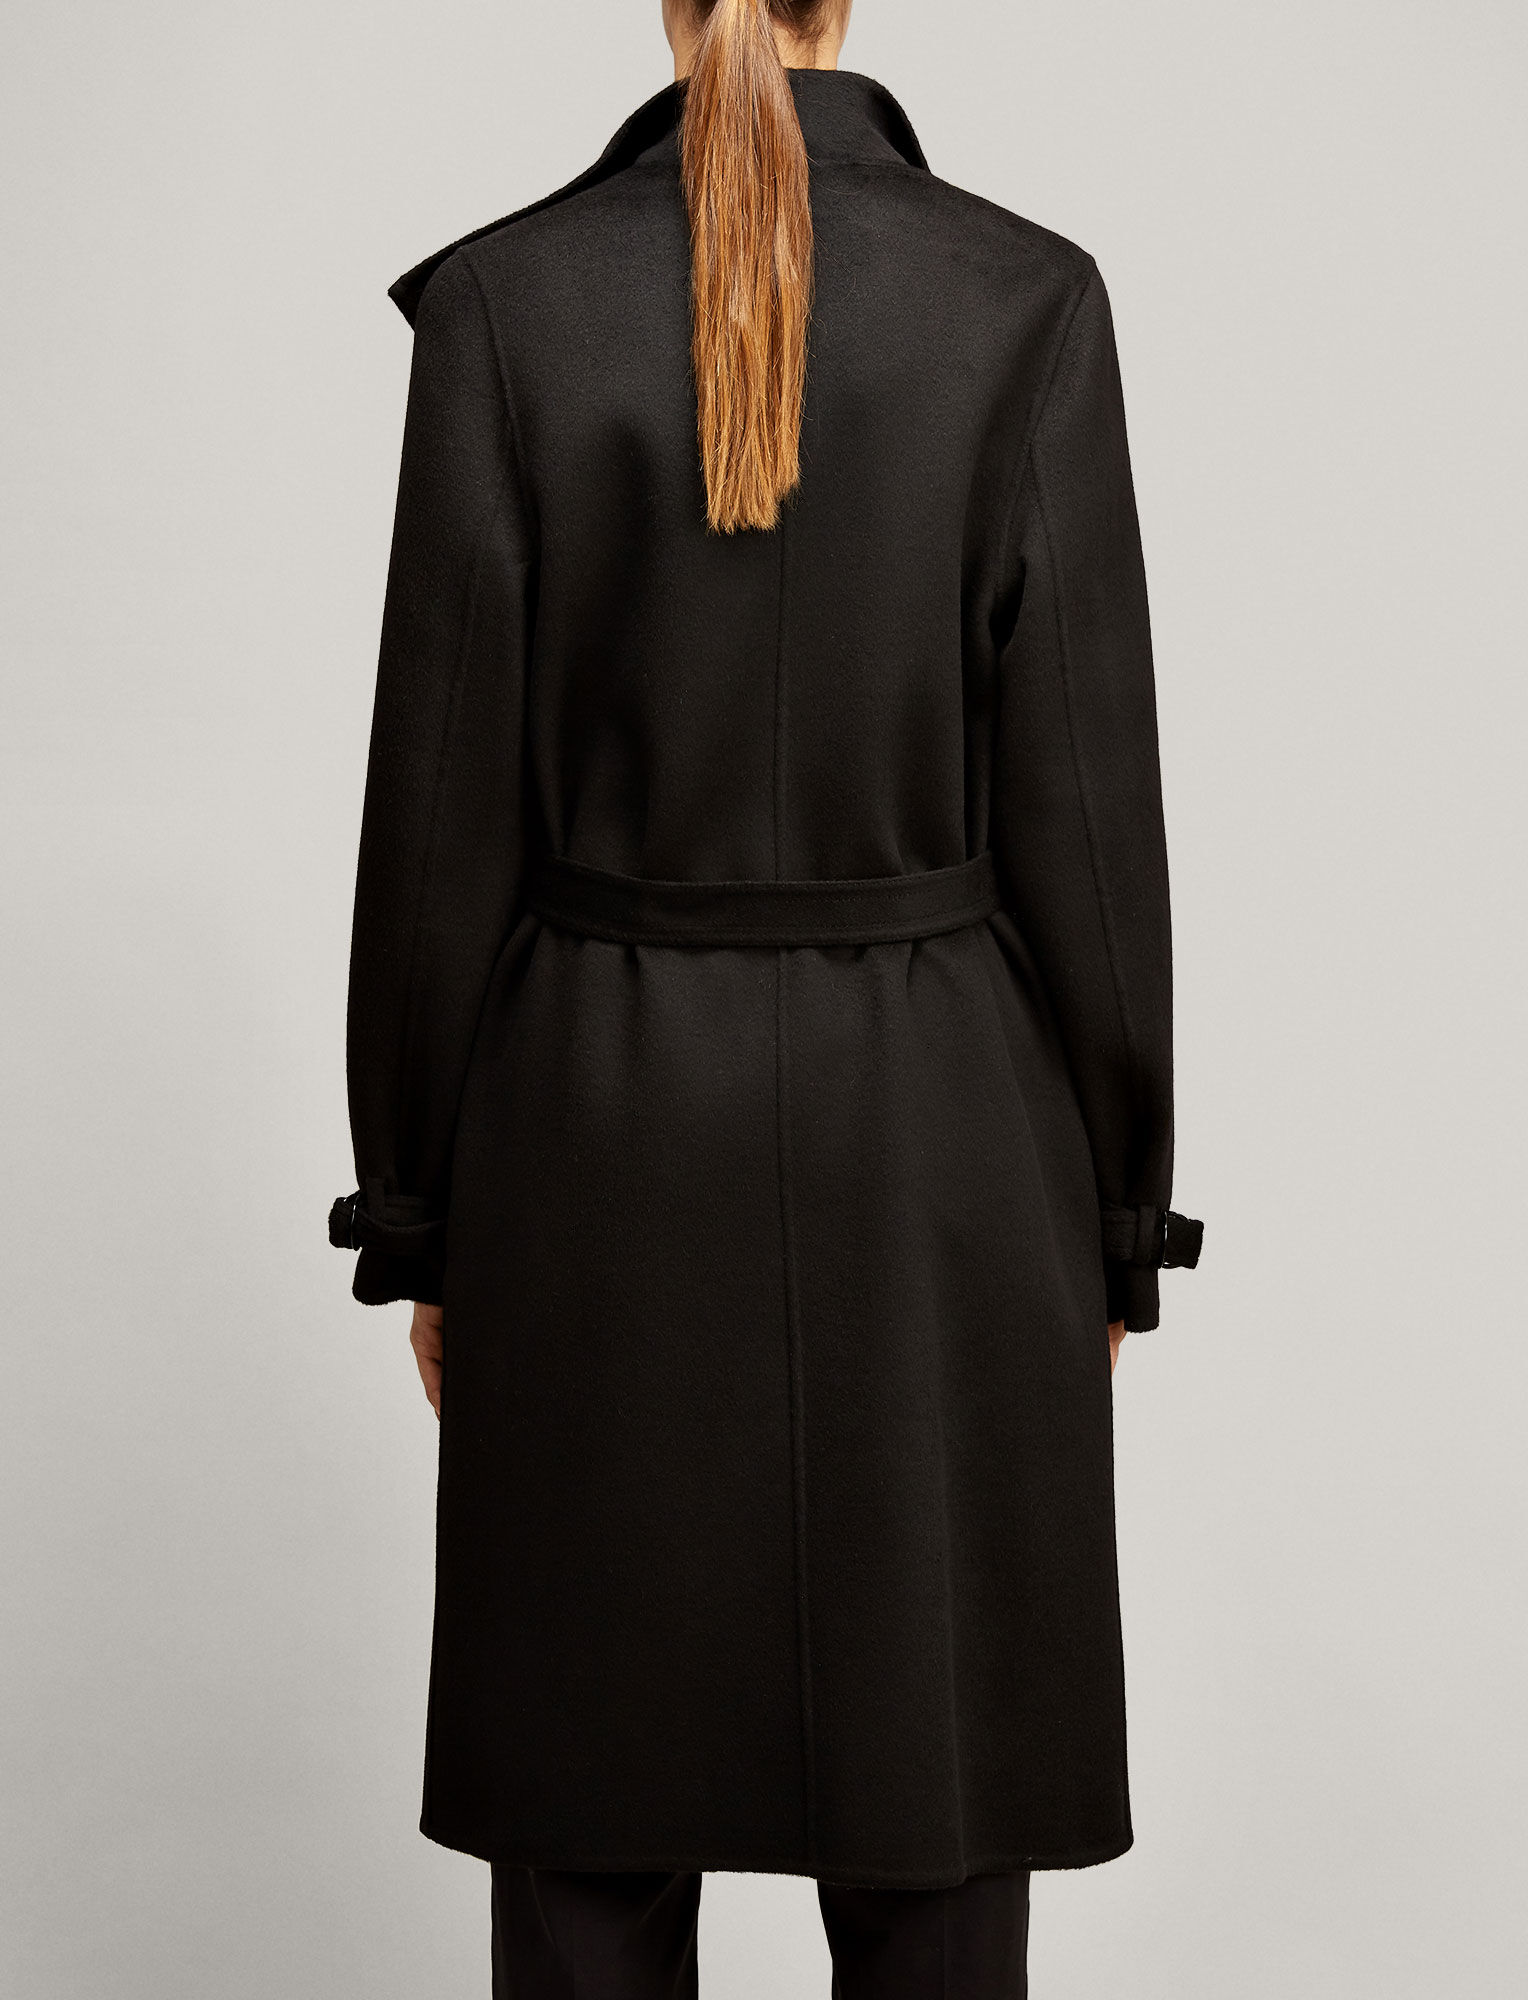 Joseph, New Lima Double Cashmere Coat, in BLACK